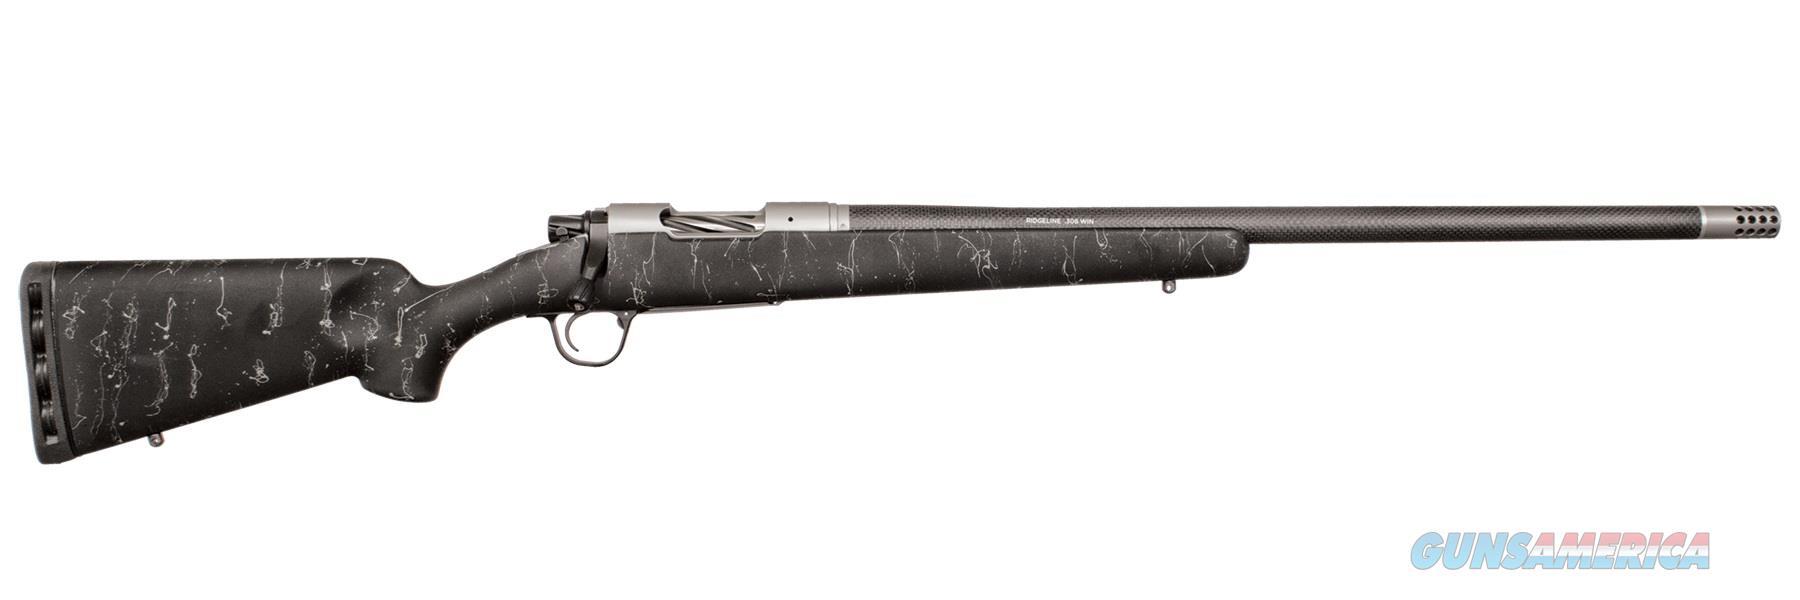 "Ridgeline 6.5-284 Blk/Gry 26"" CA10299-915211  Guns > Rifles > C Misc Rifles"